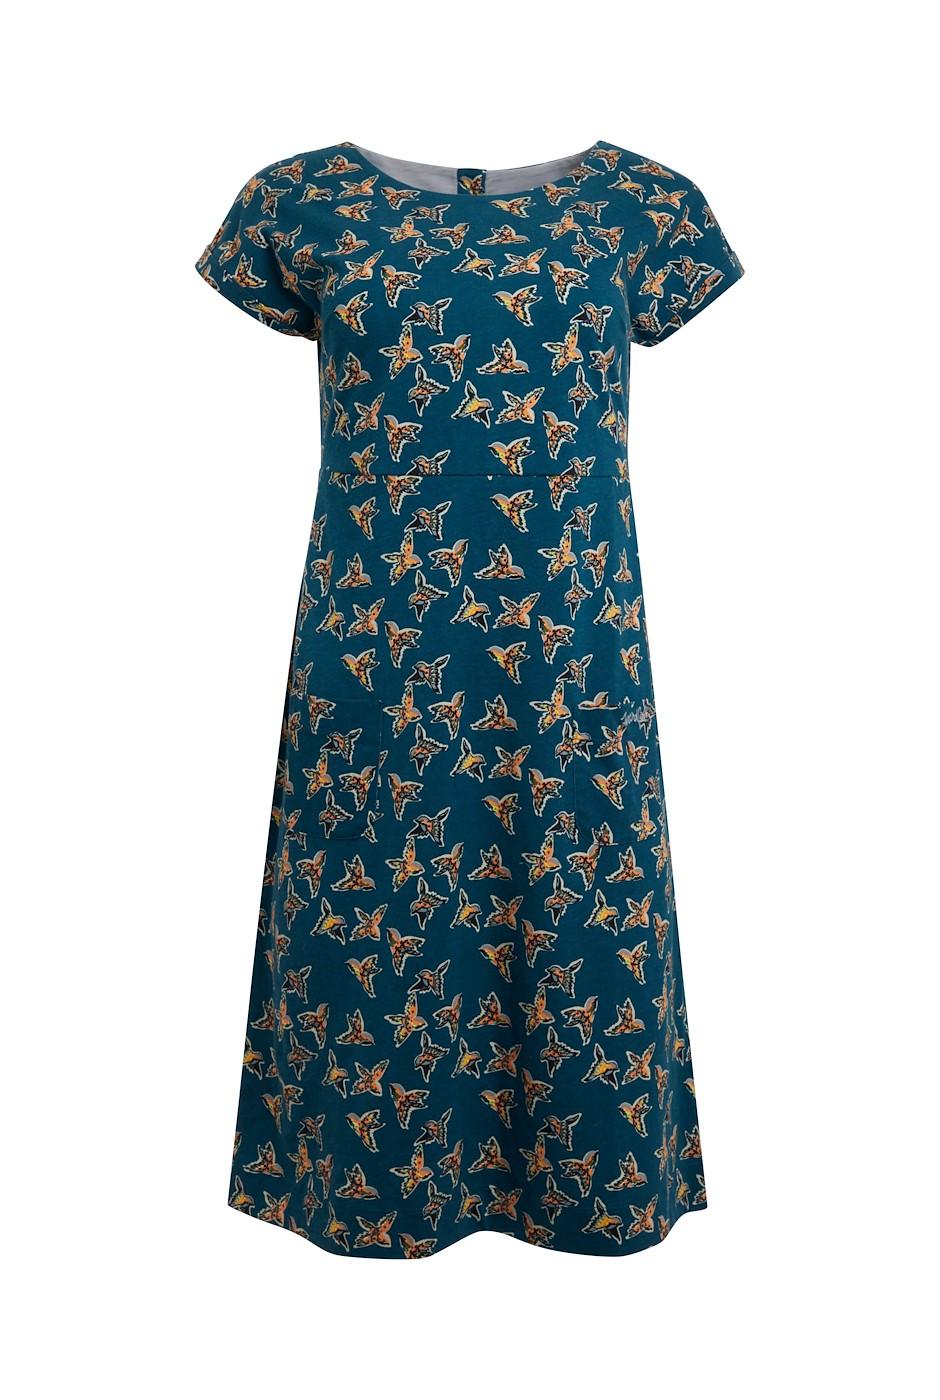 Tallahassee Organic Printed Jersey Dress Deep Teal